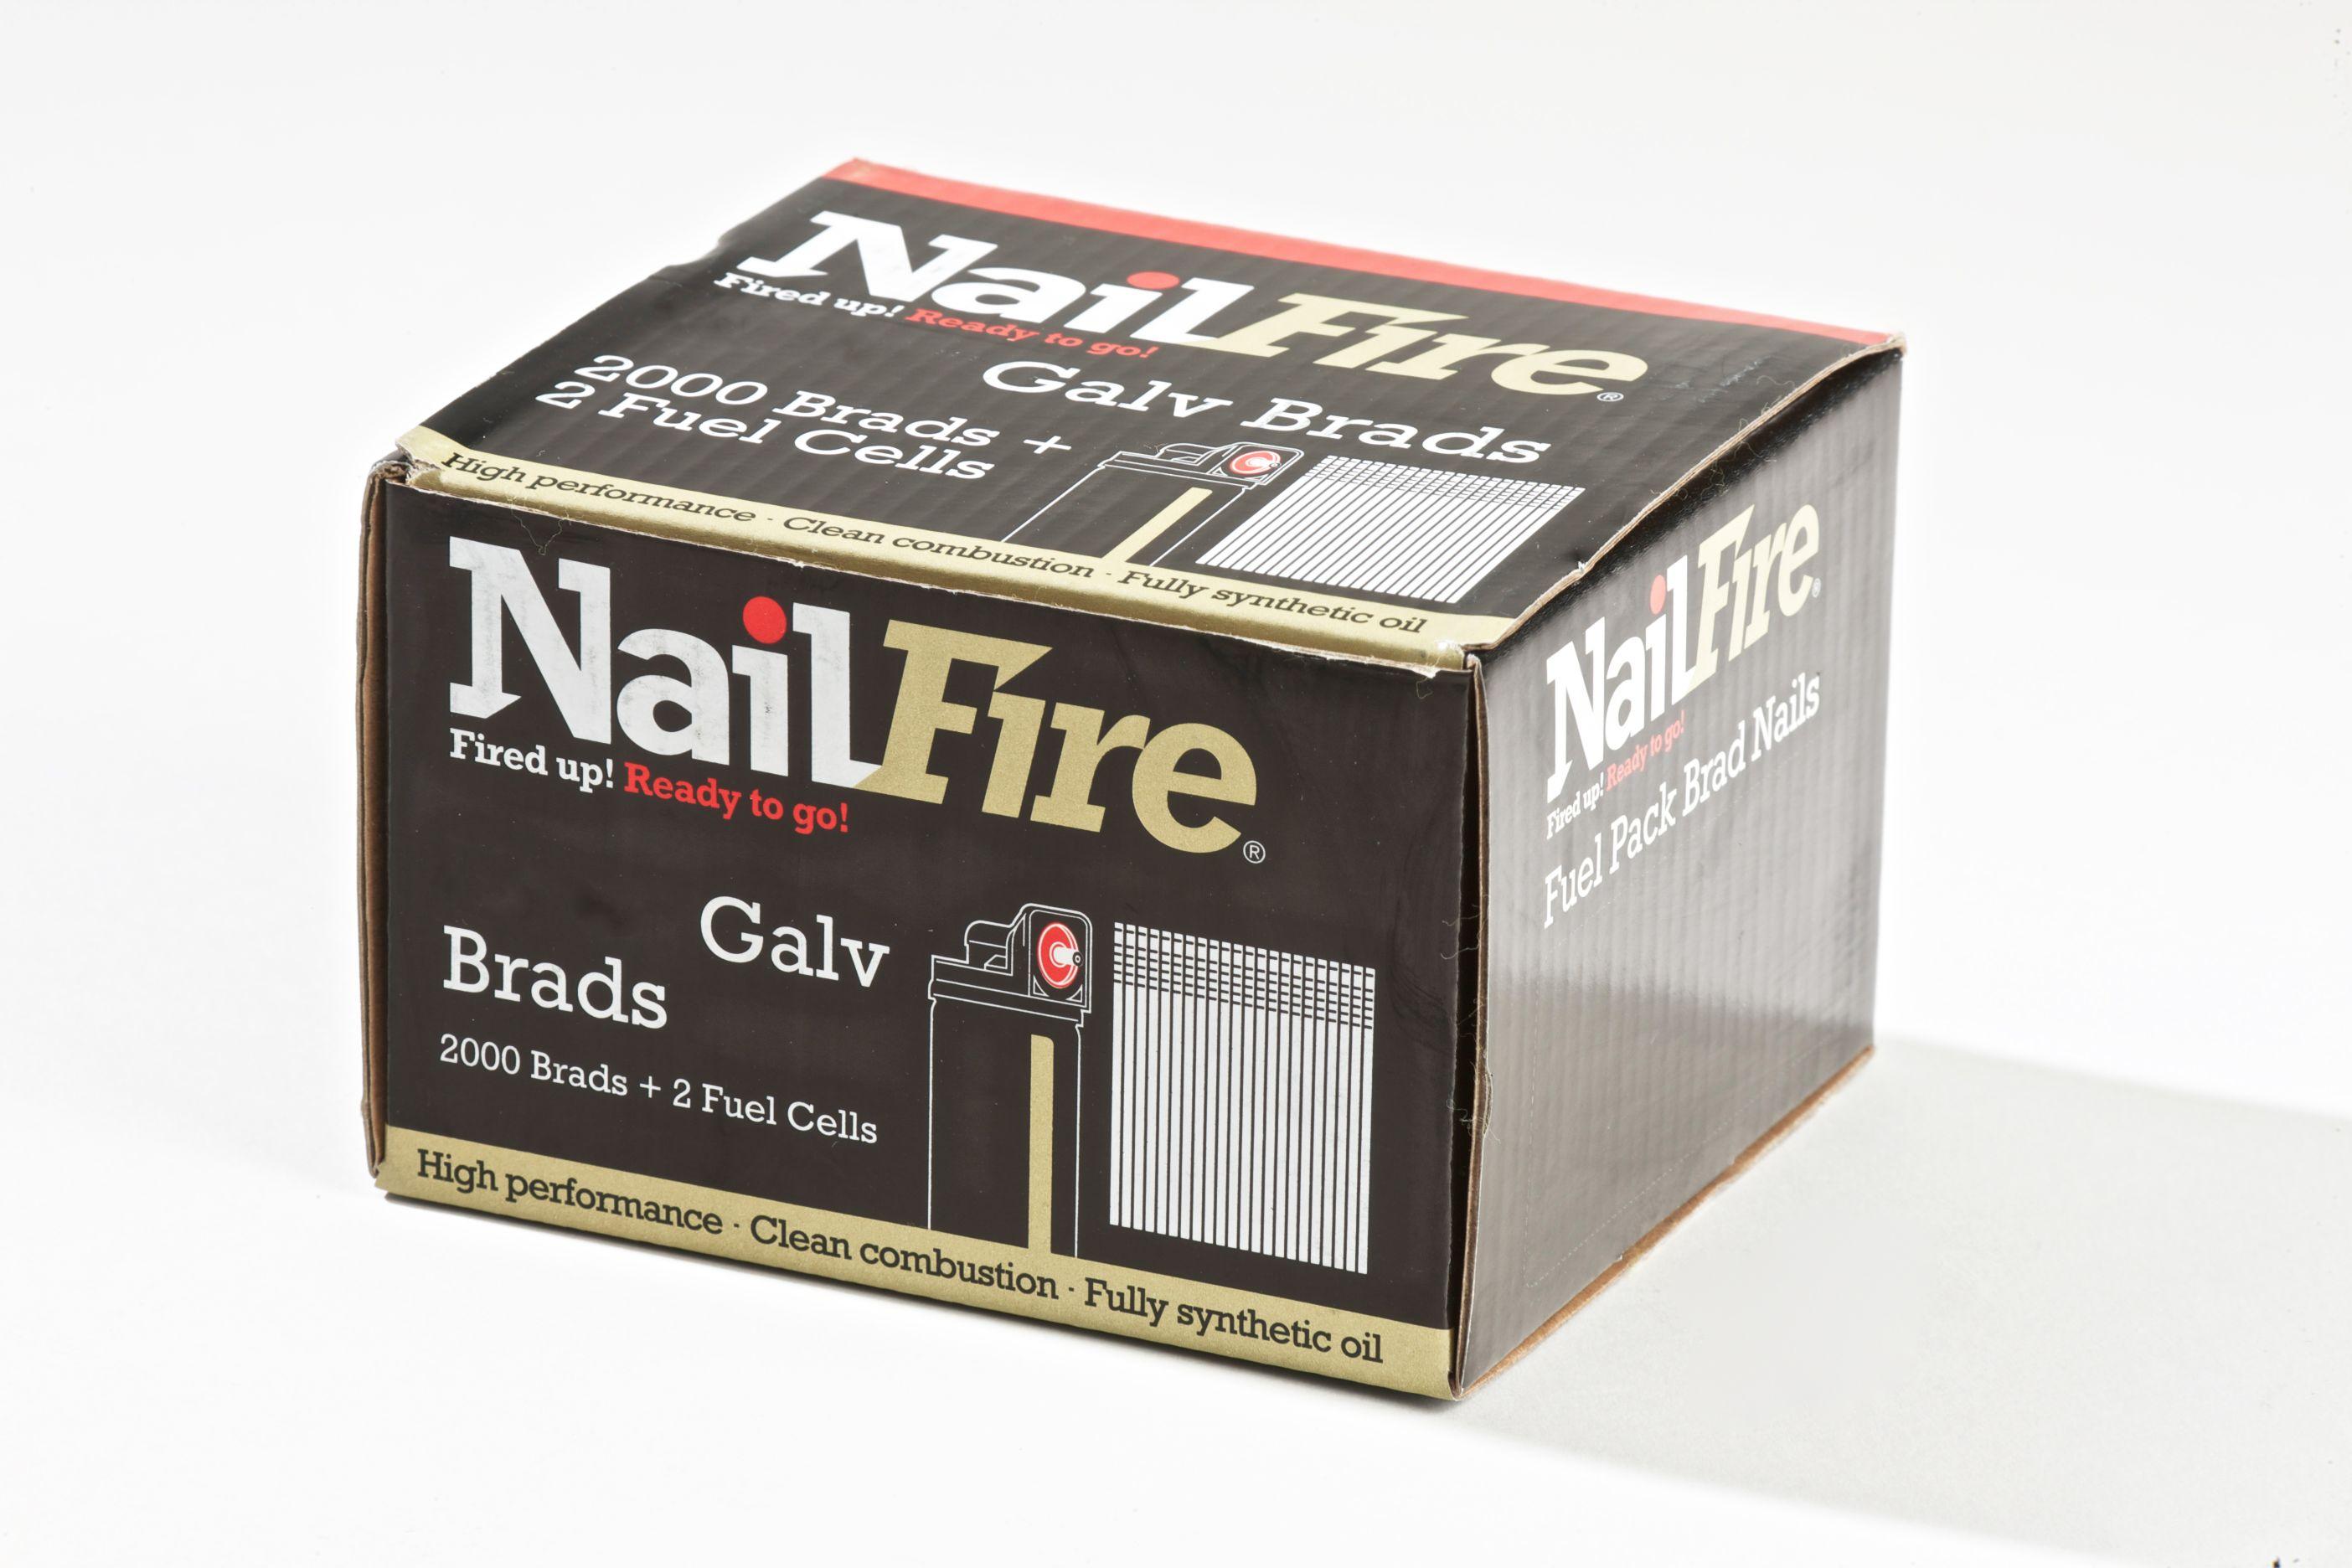 NAILFIRE 2ND FIX STRAIGHT E-GALV BRAD & FUEL PACK 25MM (TUB OF 2000)